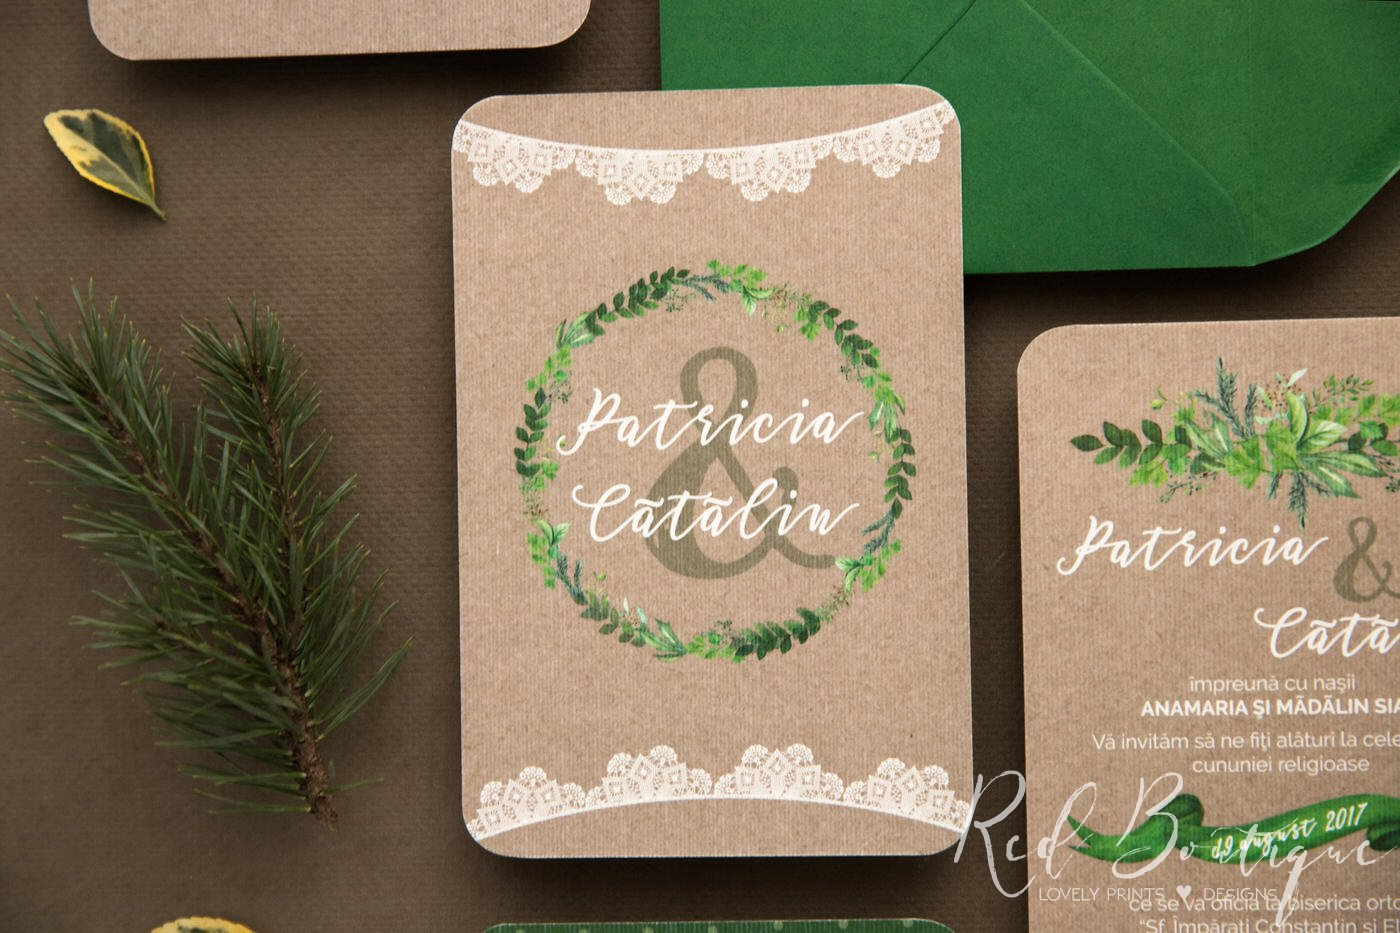 invitatie vintage cu verdeata si carton texturat vintage cu dantela